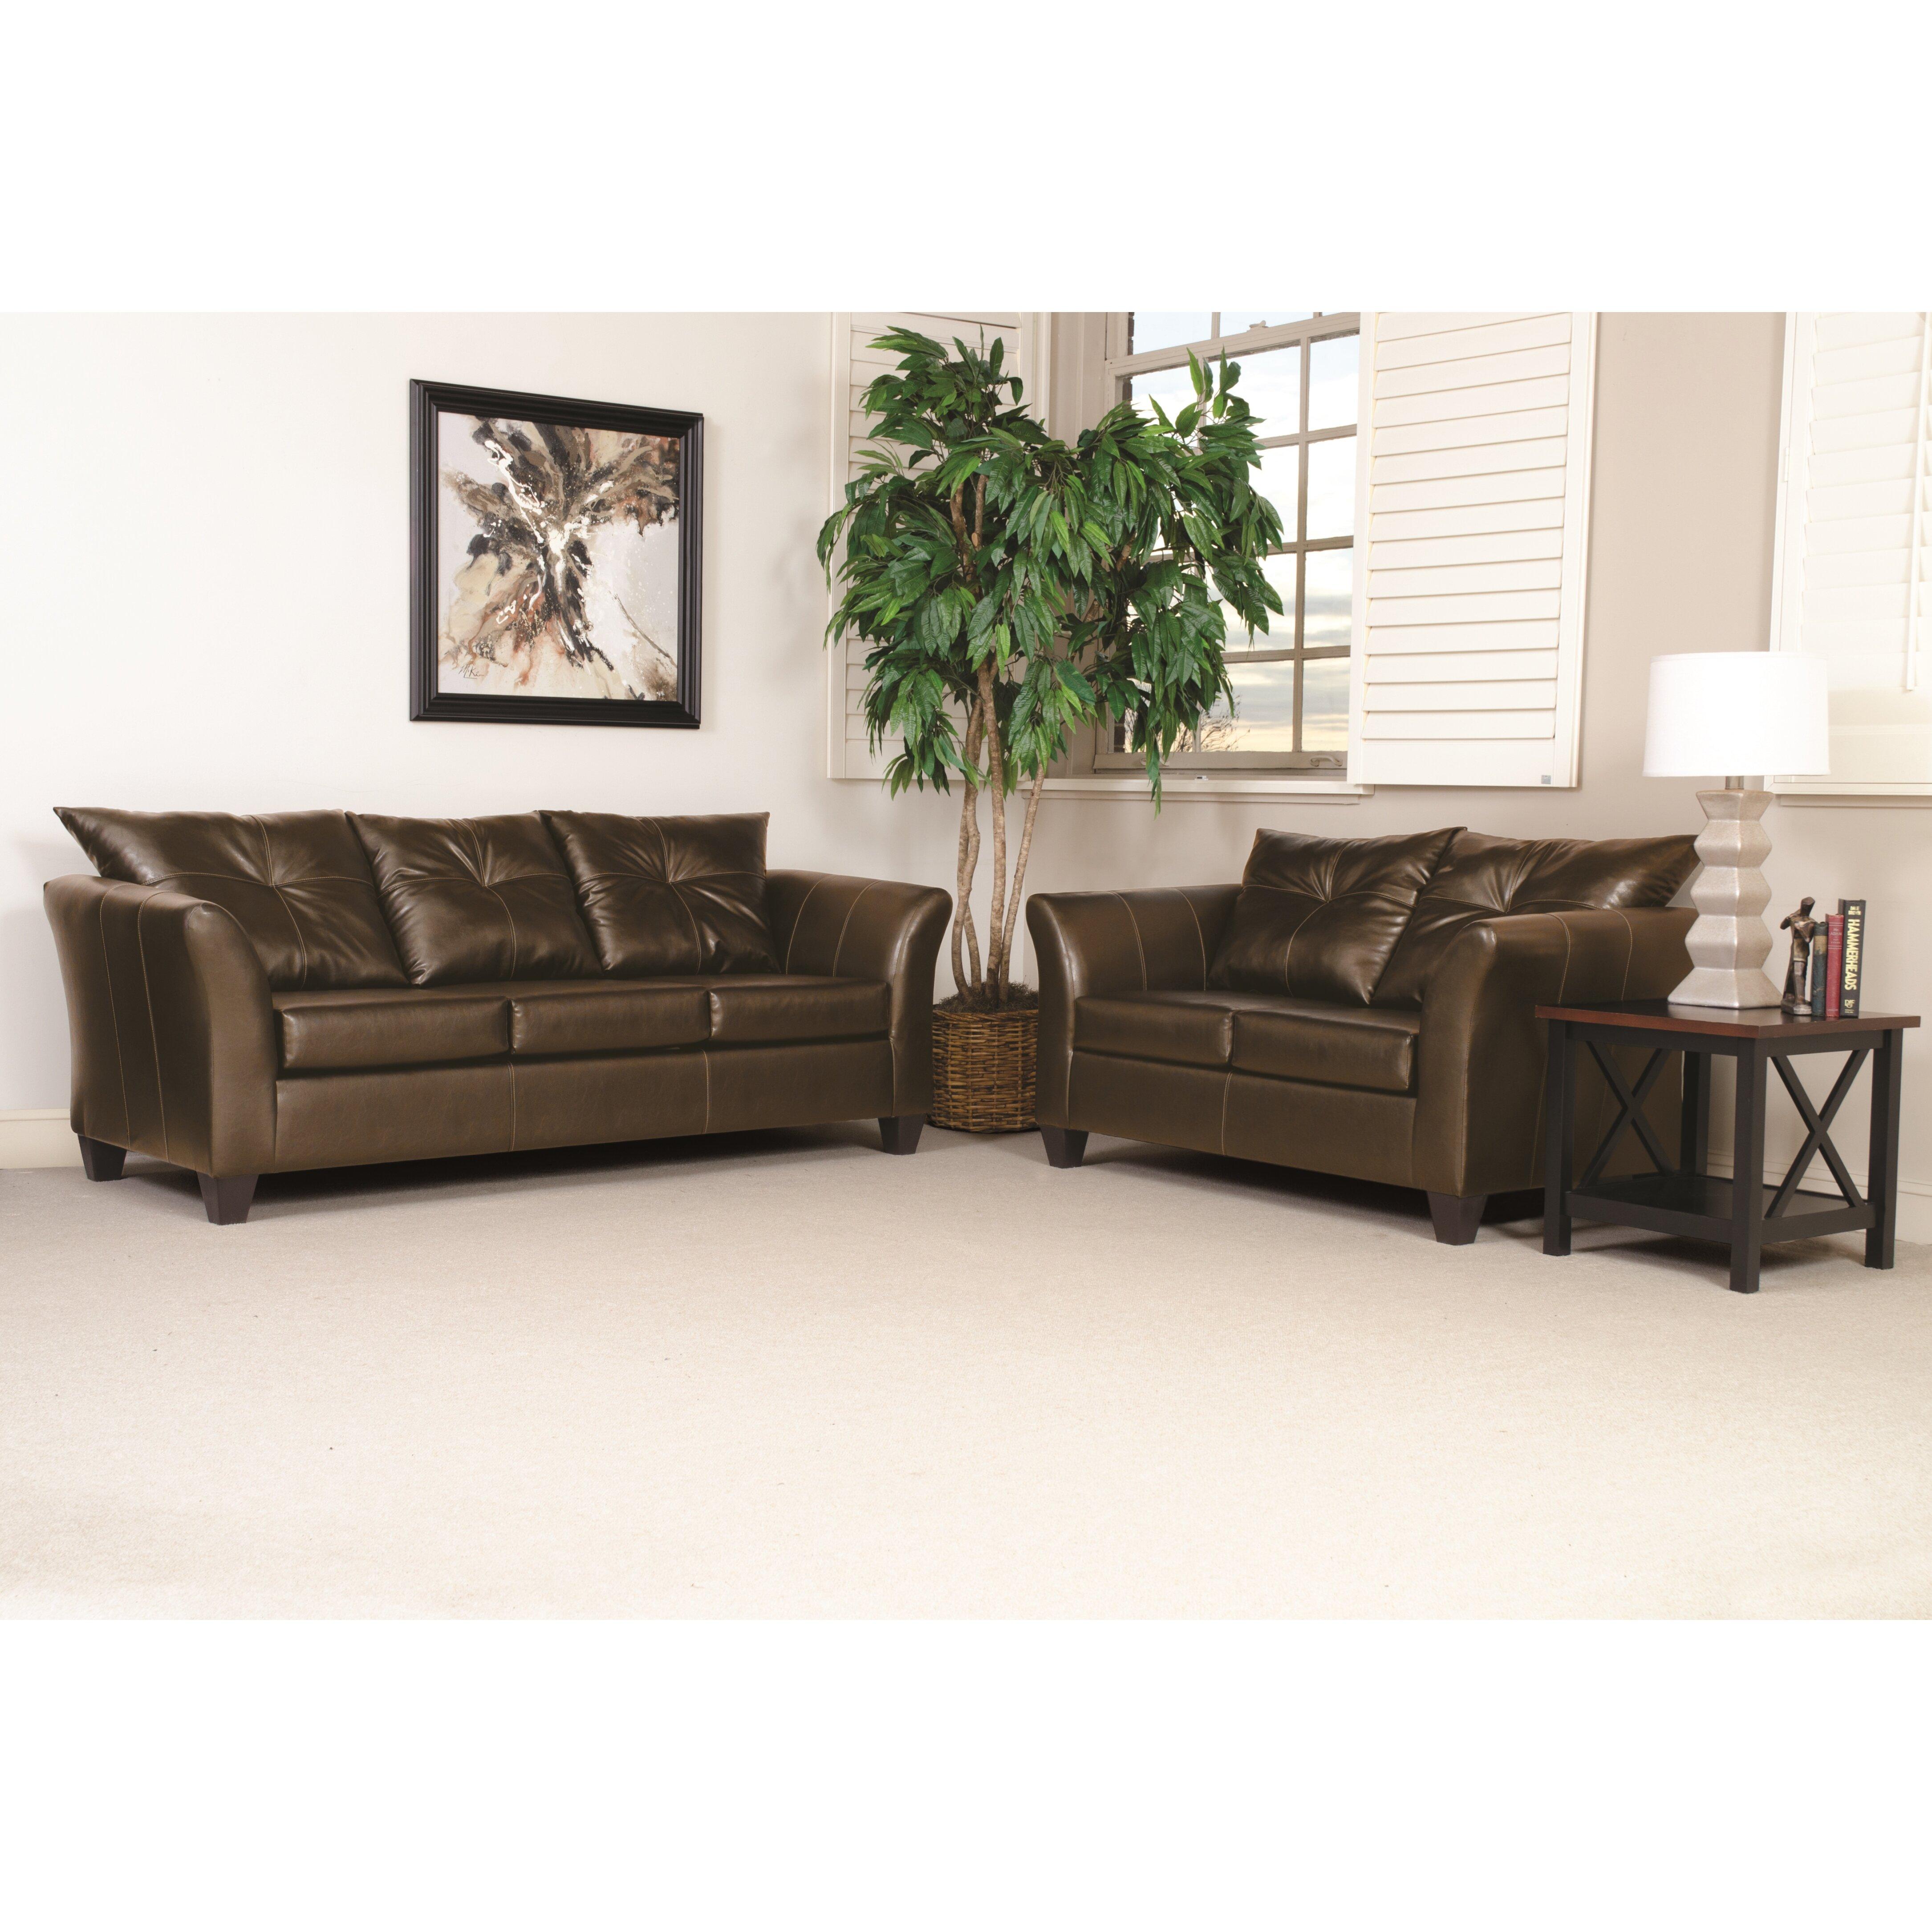 Brady Furniture Industries Marino Loveseat